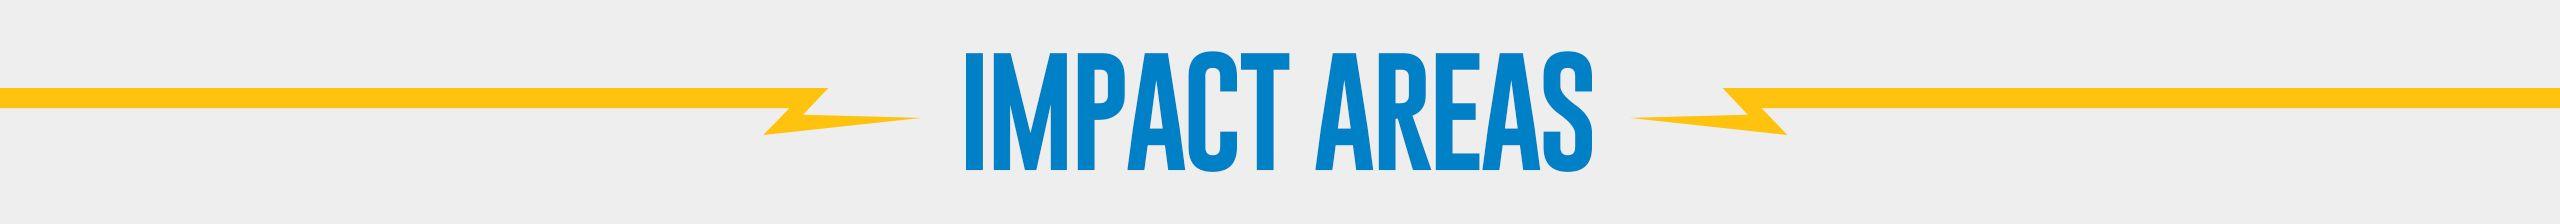 200928_Site_Impact_Fund_Home_Impact_Areas